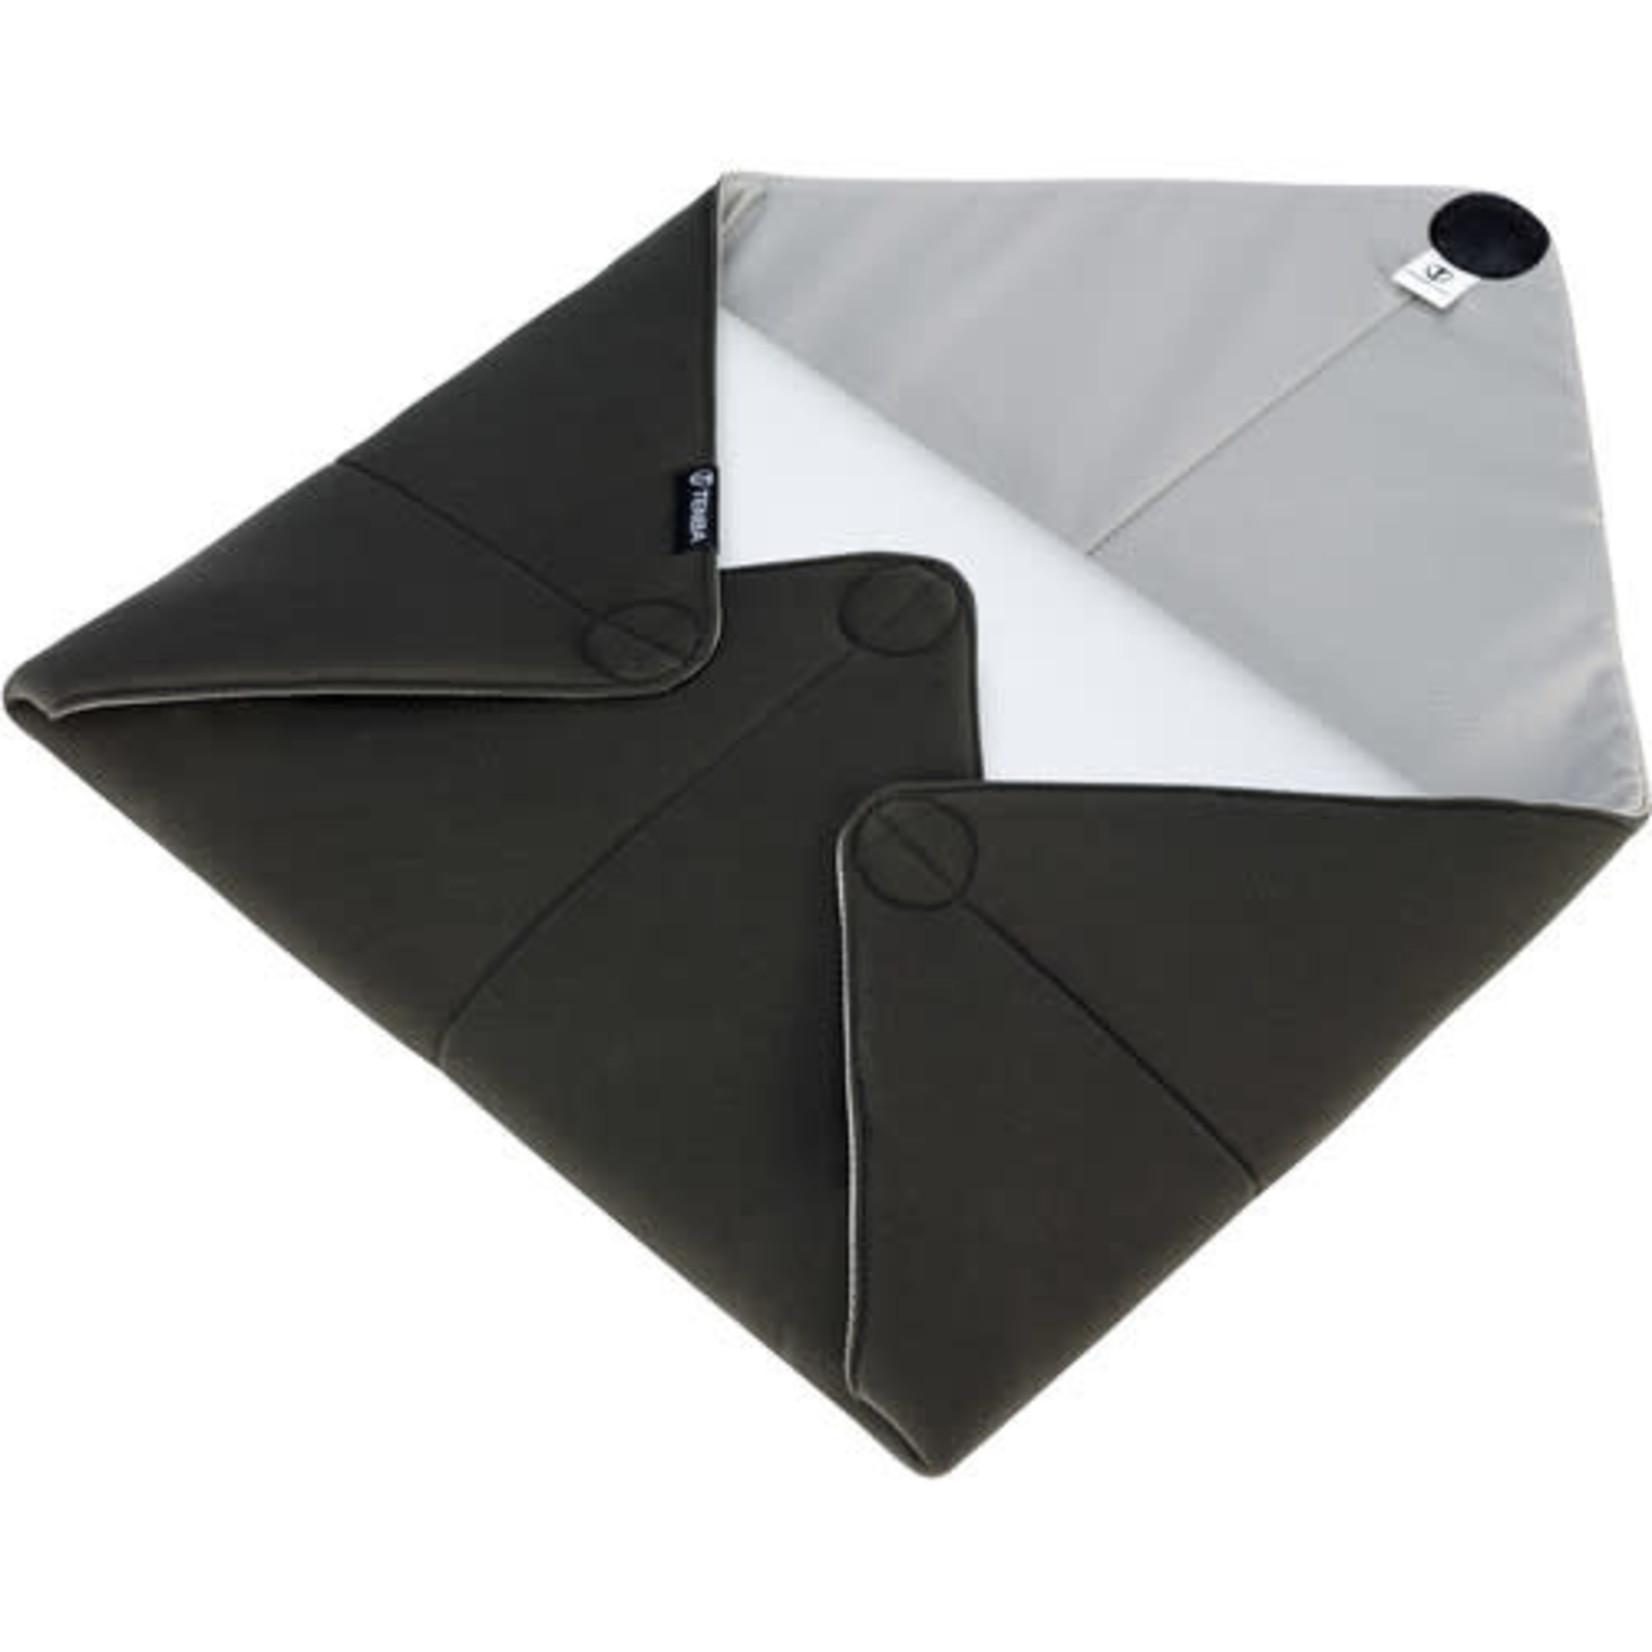 Tenba Tenba Tools 20-inch Protective Wrap - Black